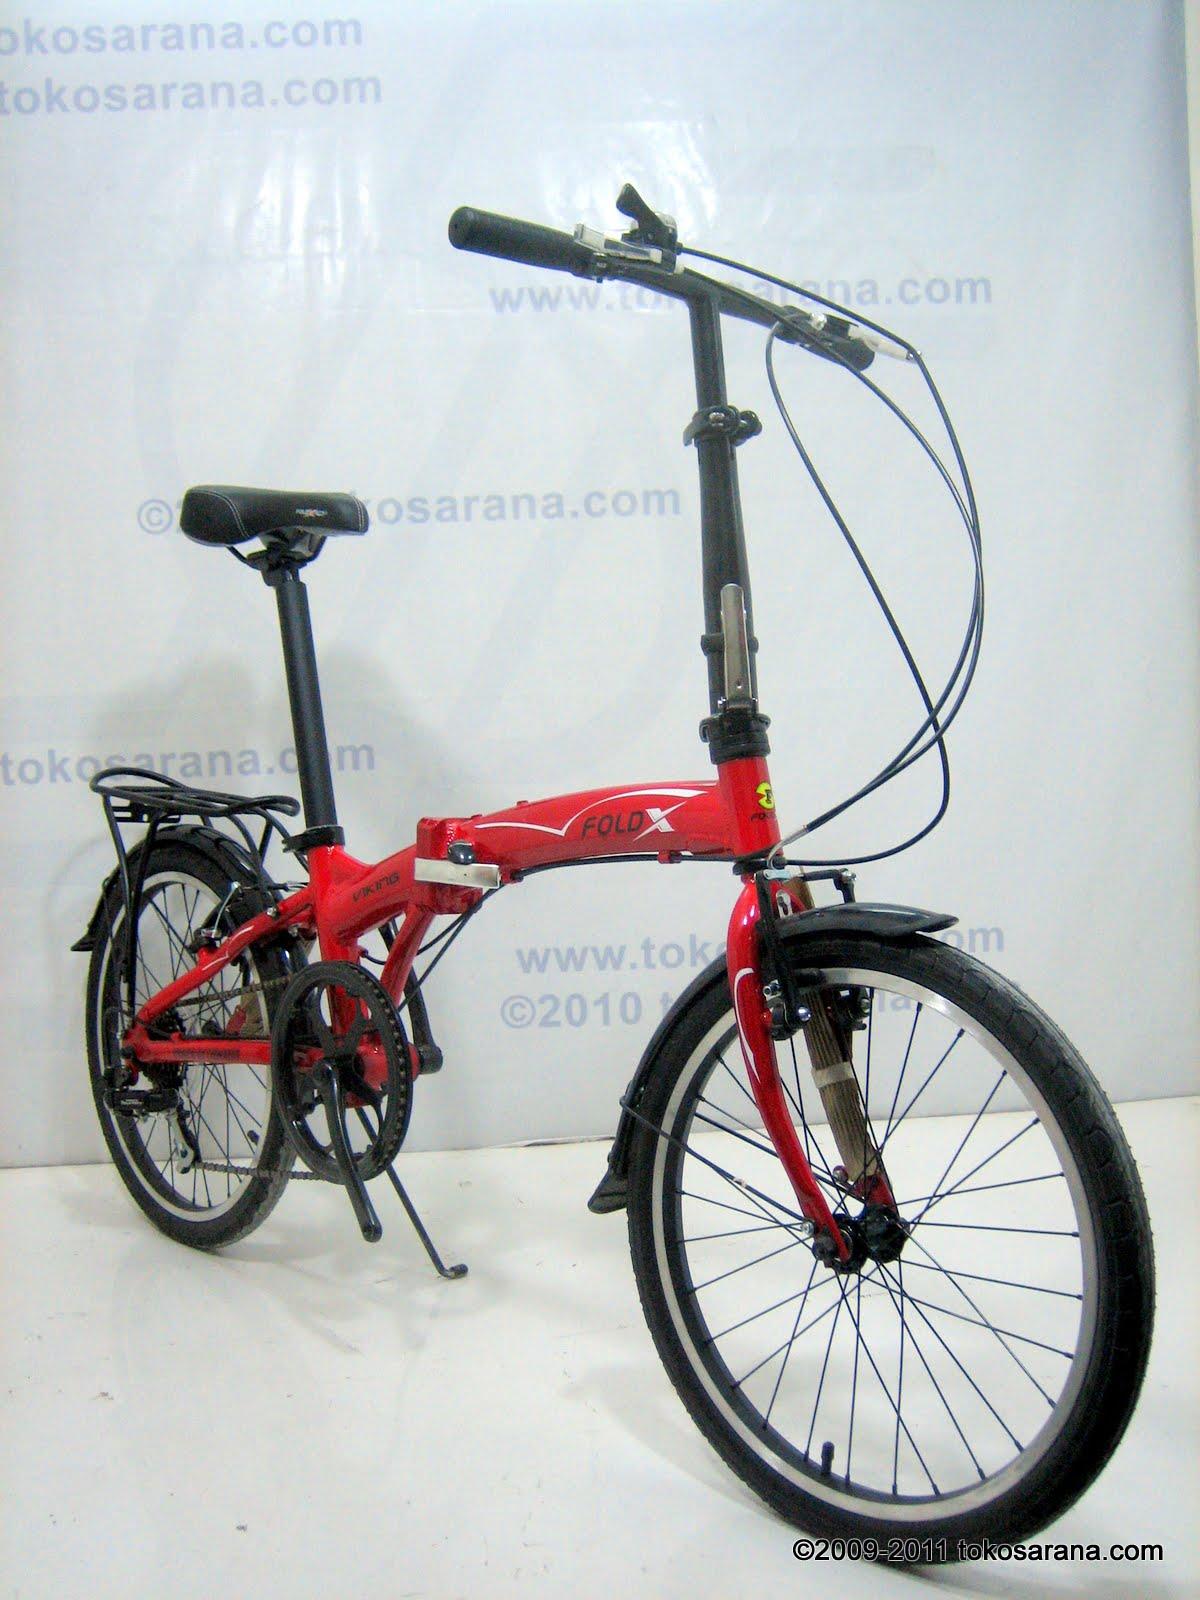 tokomagenta: A Showcase of Products: Sepeda Lipat Fold-X